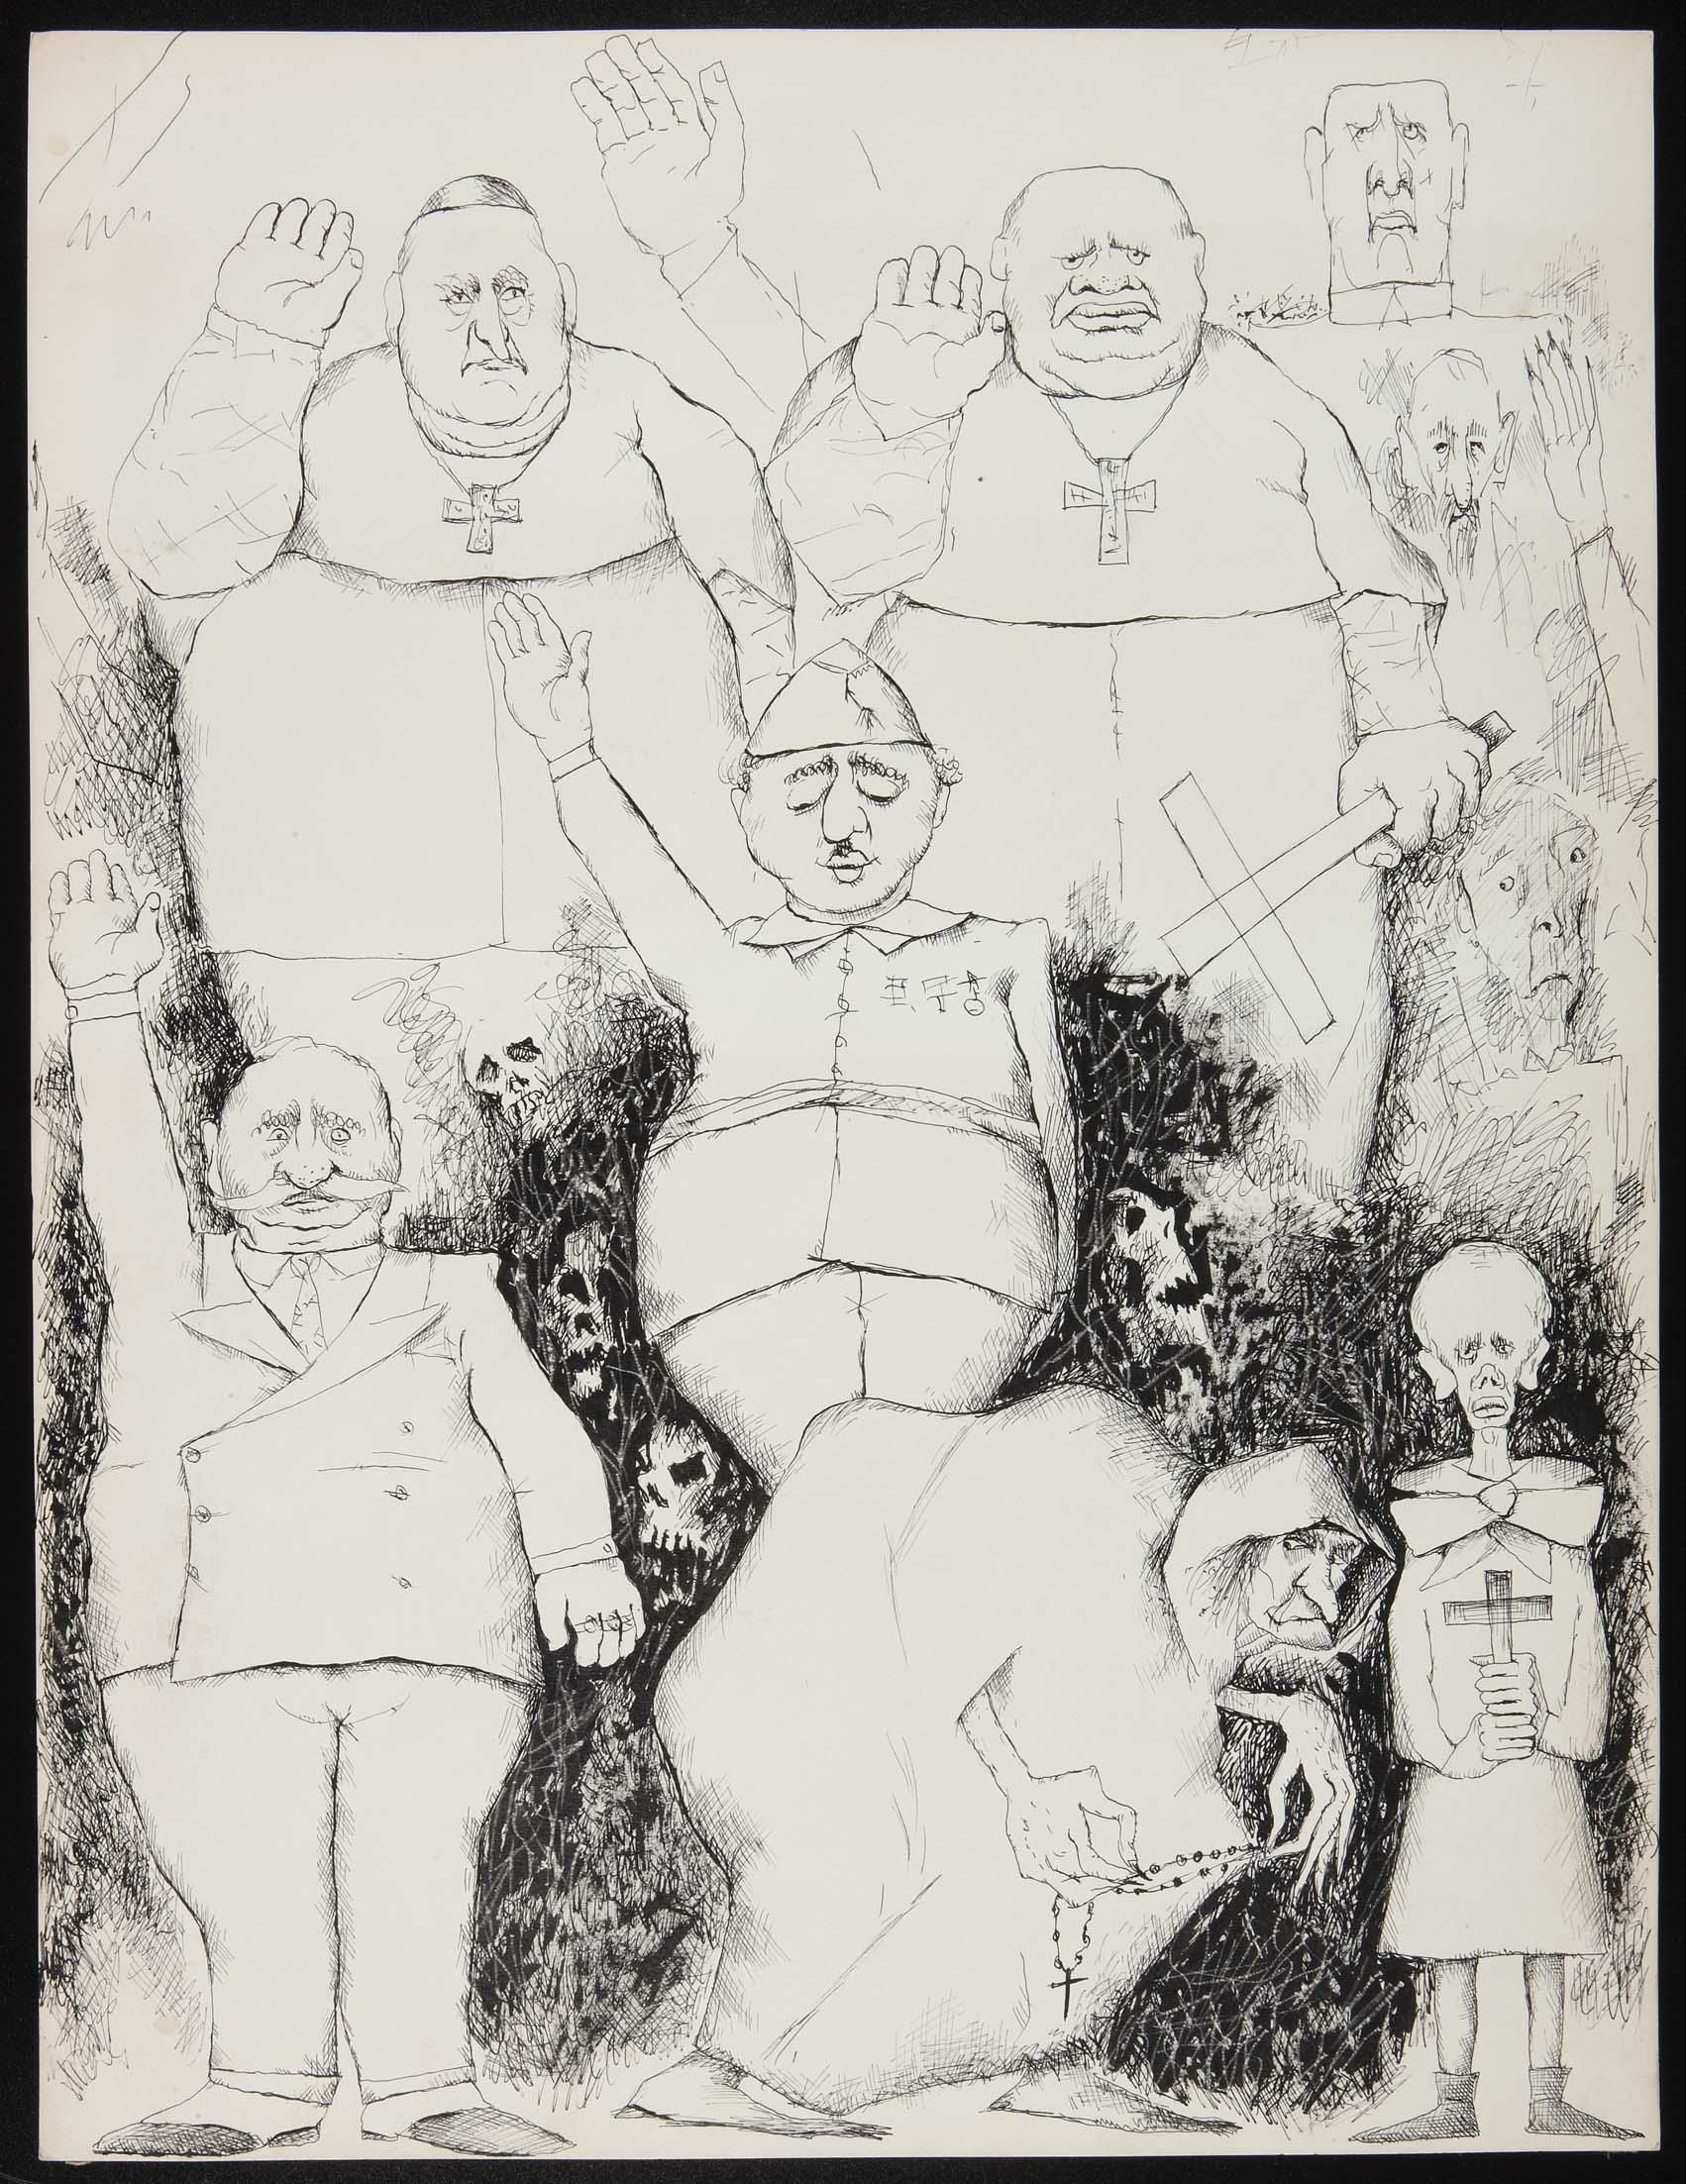 Dibujo de Luis Quintanilla de la serie La España negra de Franco